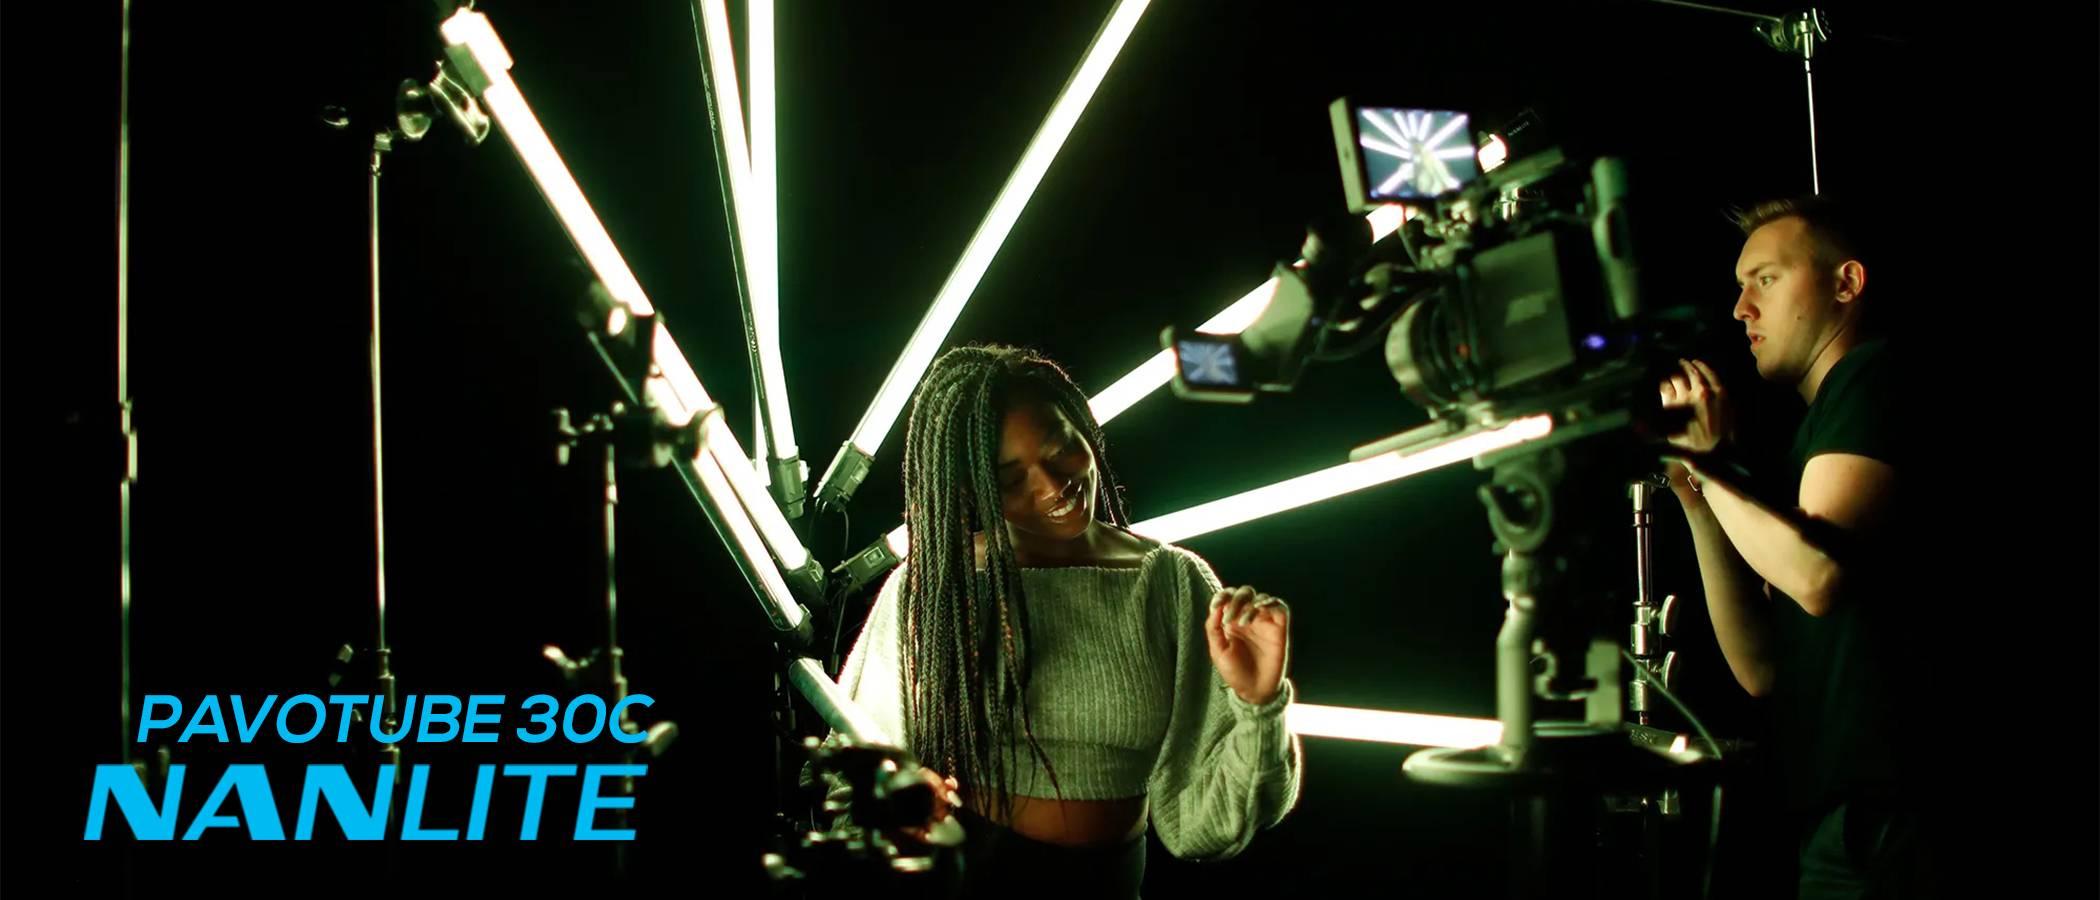 film-technika-nanlite-pavotube-30c